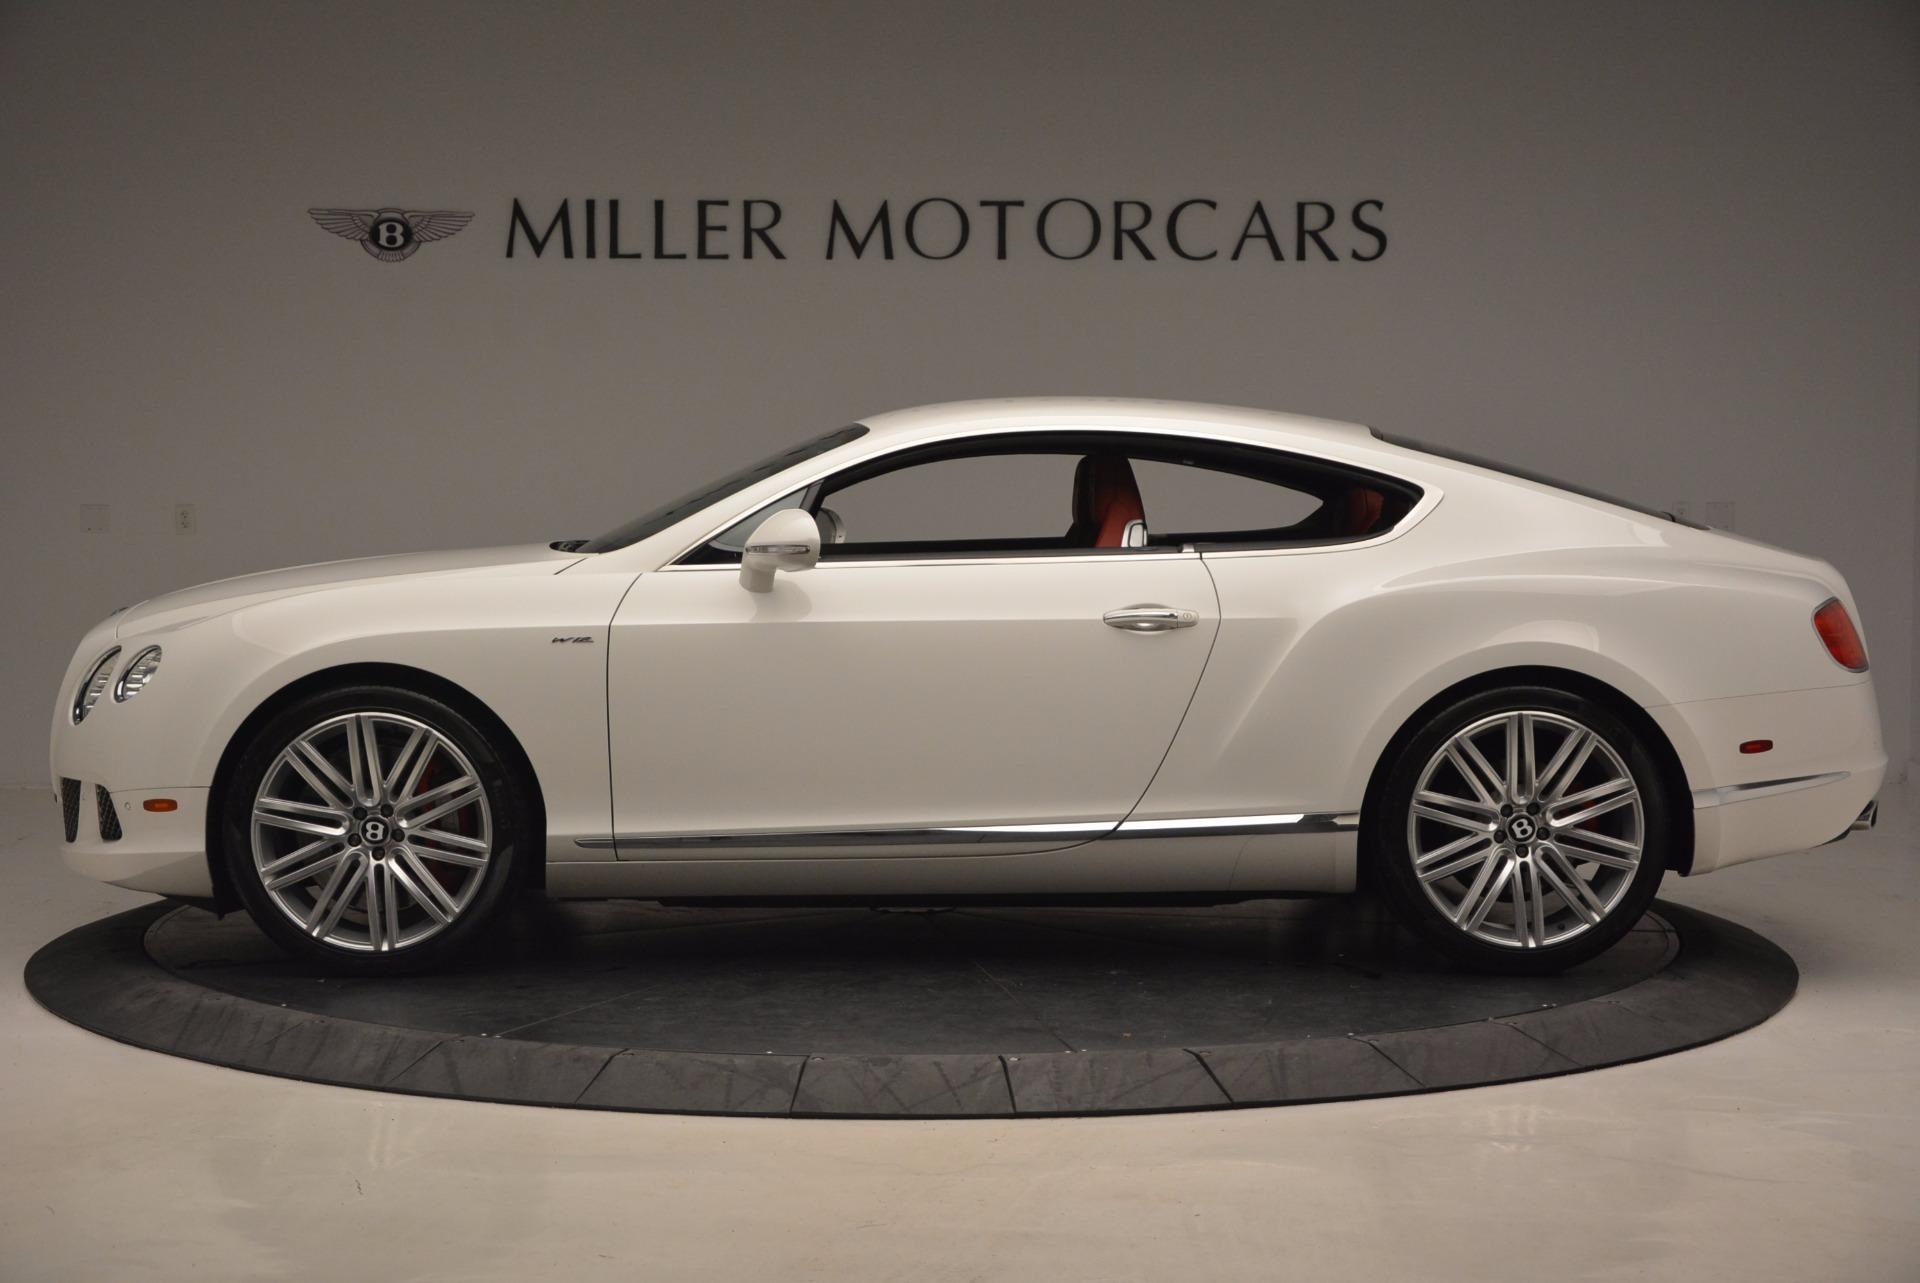 Used 2014 Bentley Continental GT Speed For Sale In Westport, CT 1102_p4